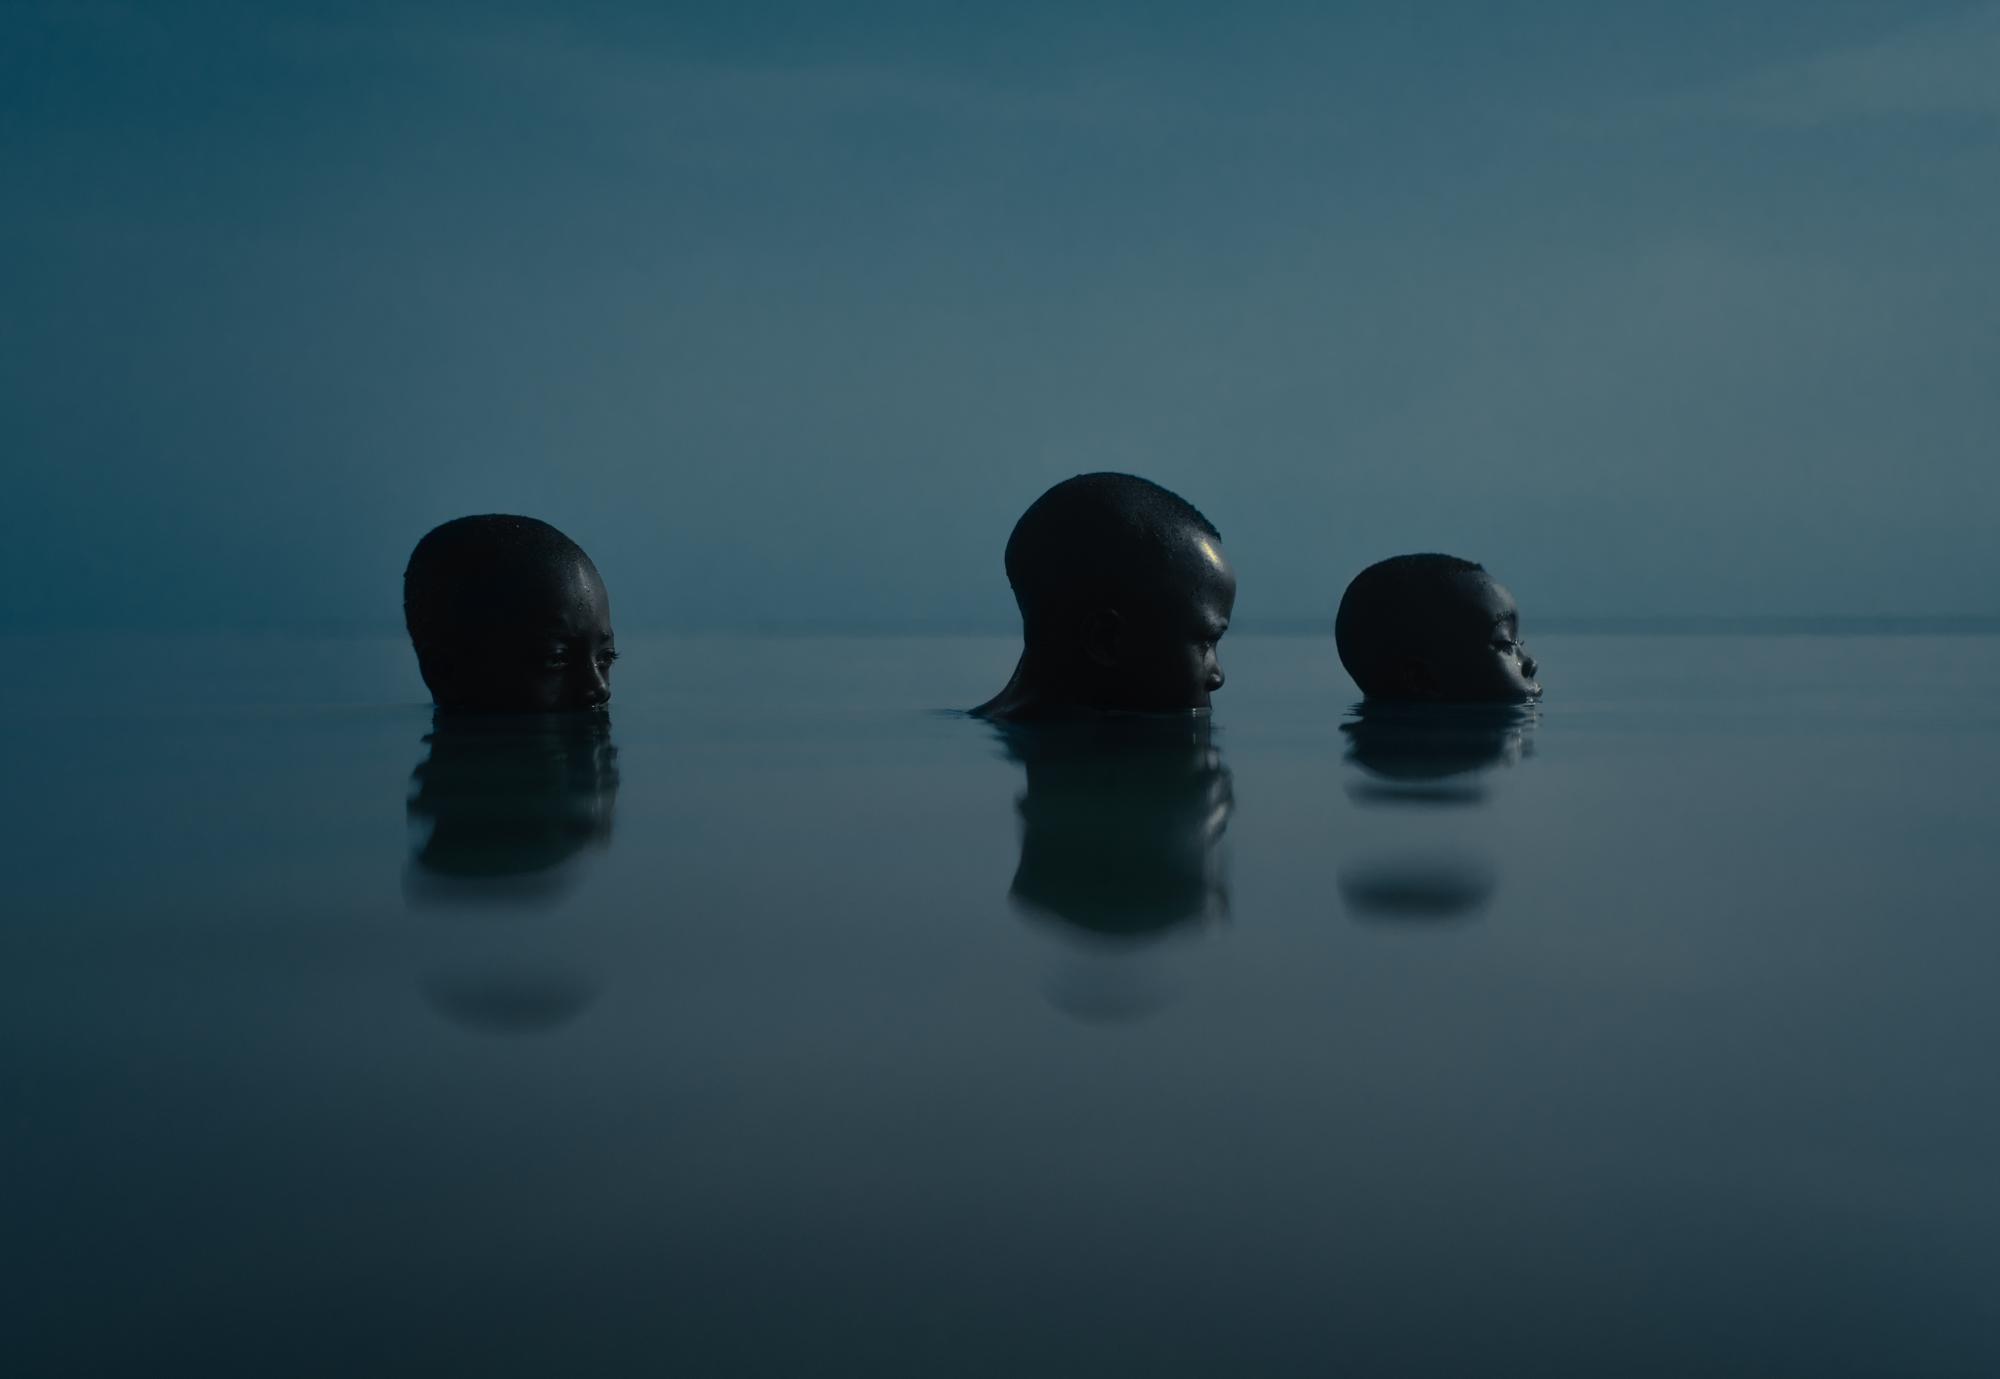 Skimming across the surface of Ghana's Lake Volta